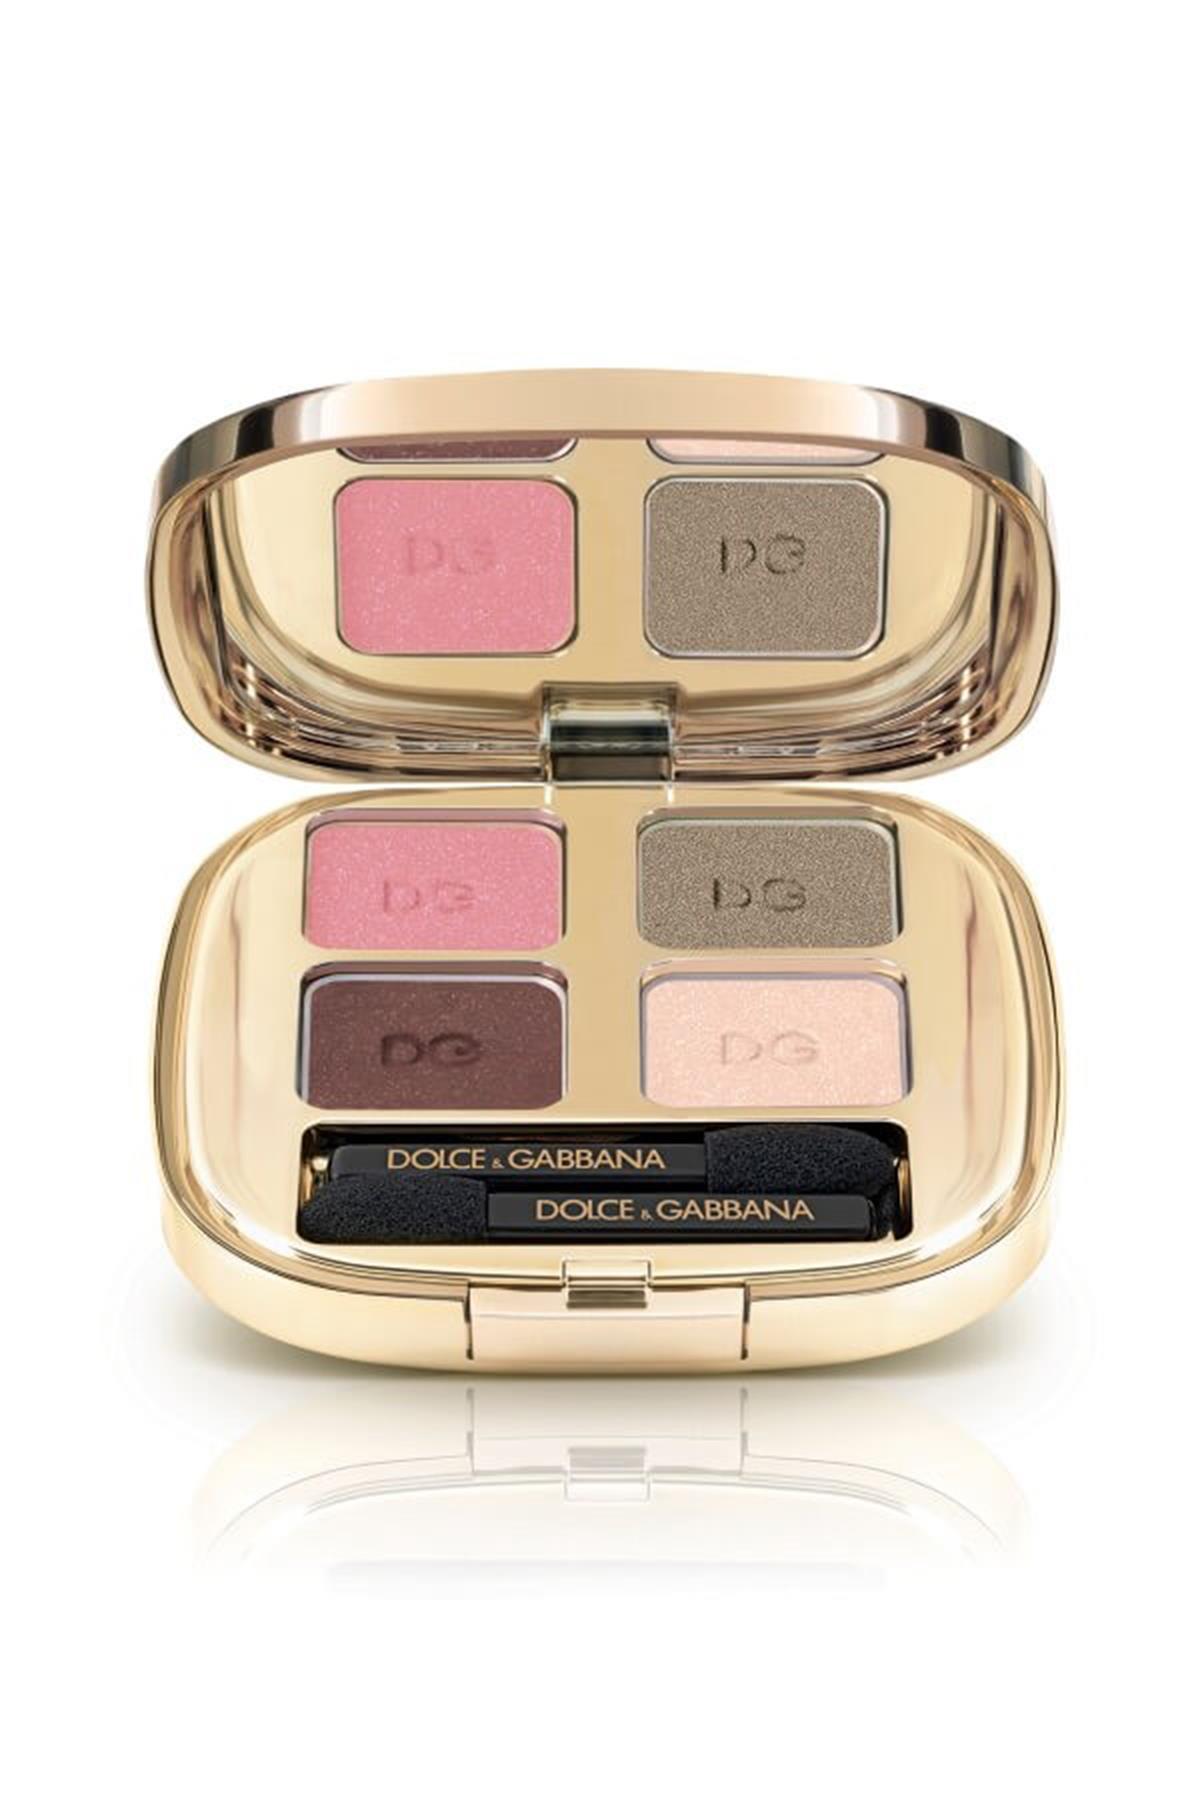 Dolce Gabbana Smooth Eye Colour Quad Göz Farı 142 Dolce Garden